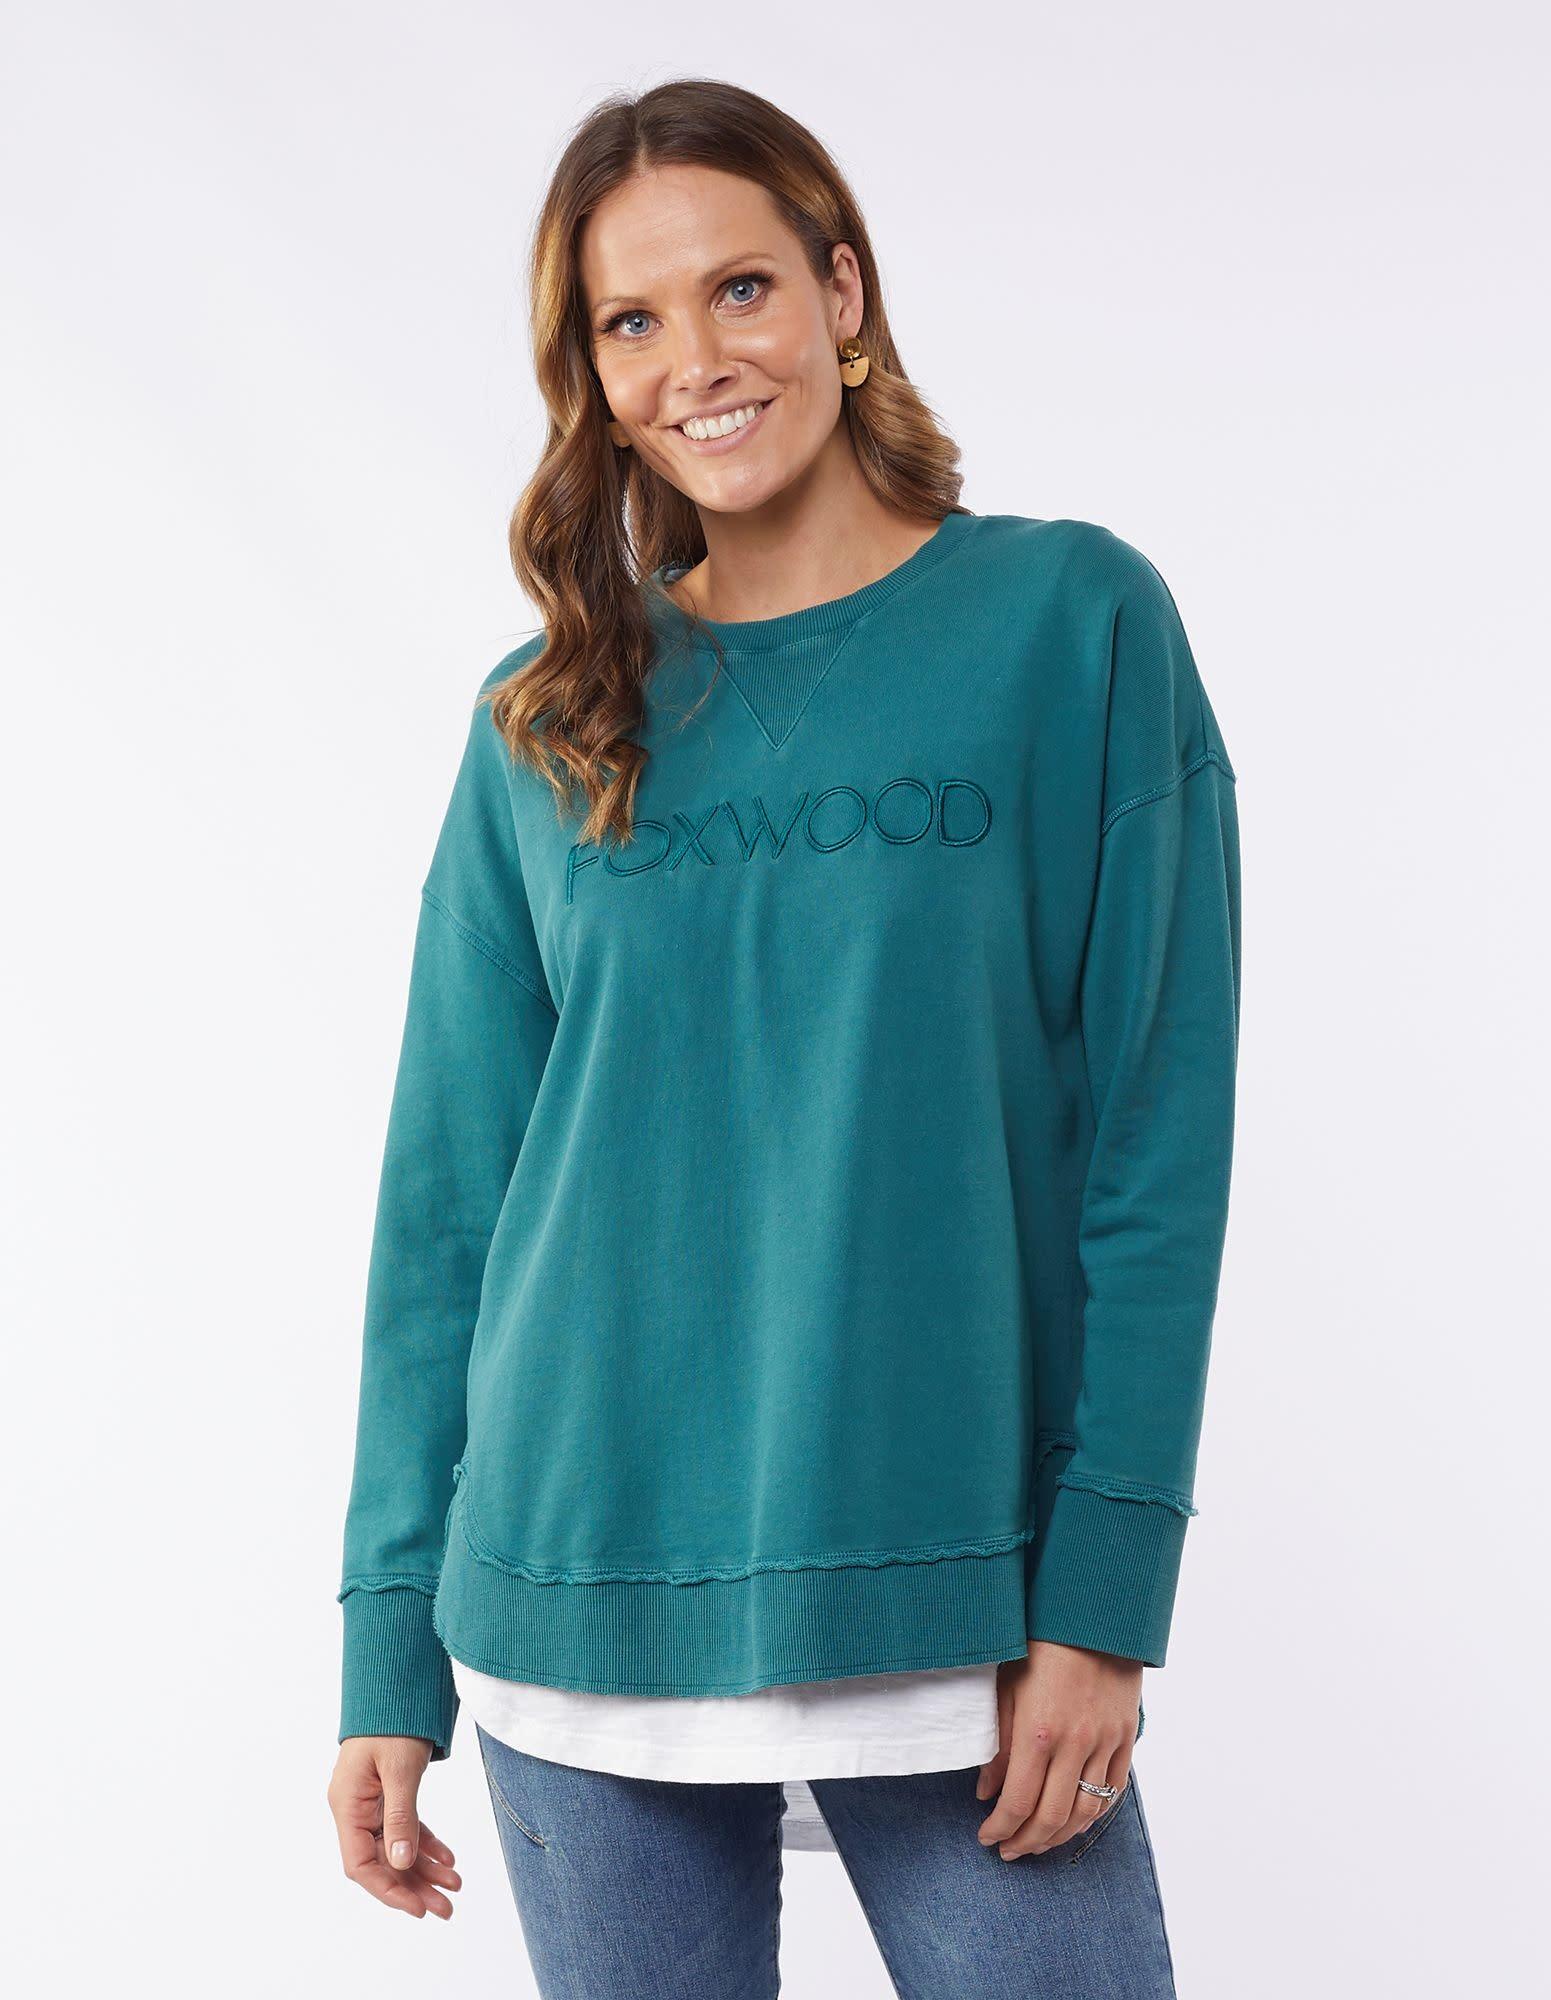 Foxwood Simplified Crew Green (N)